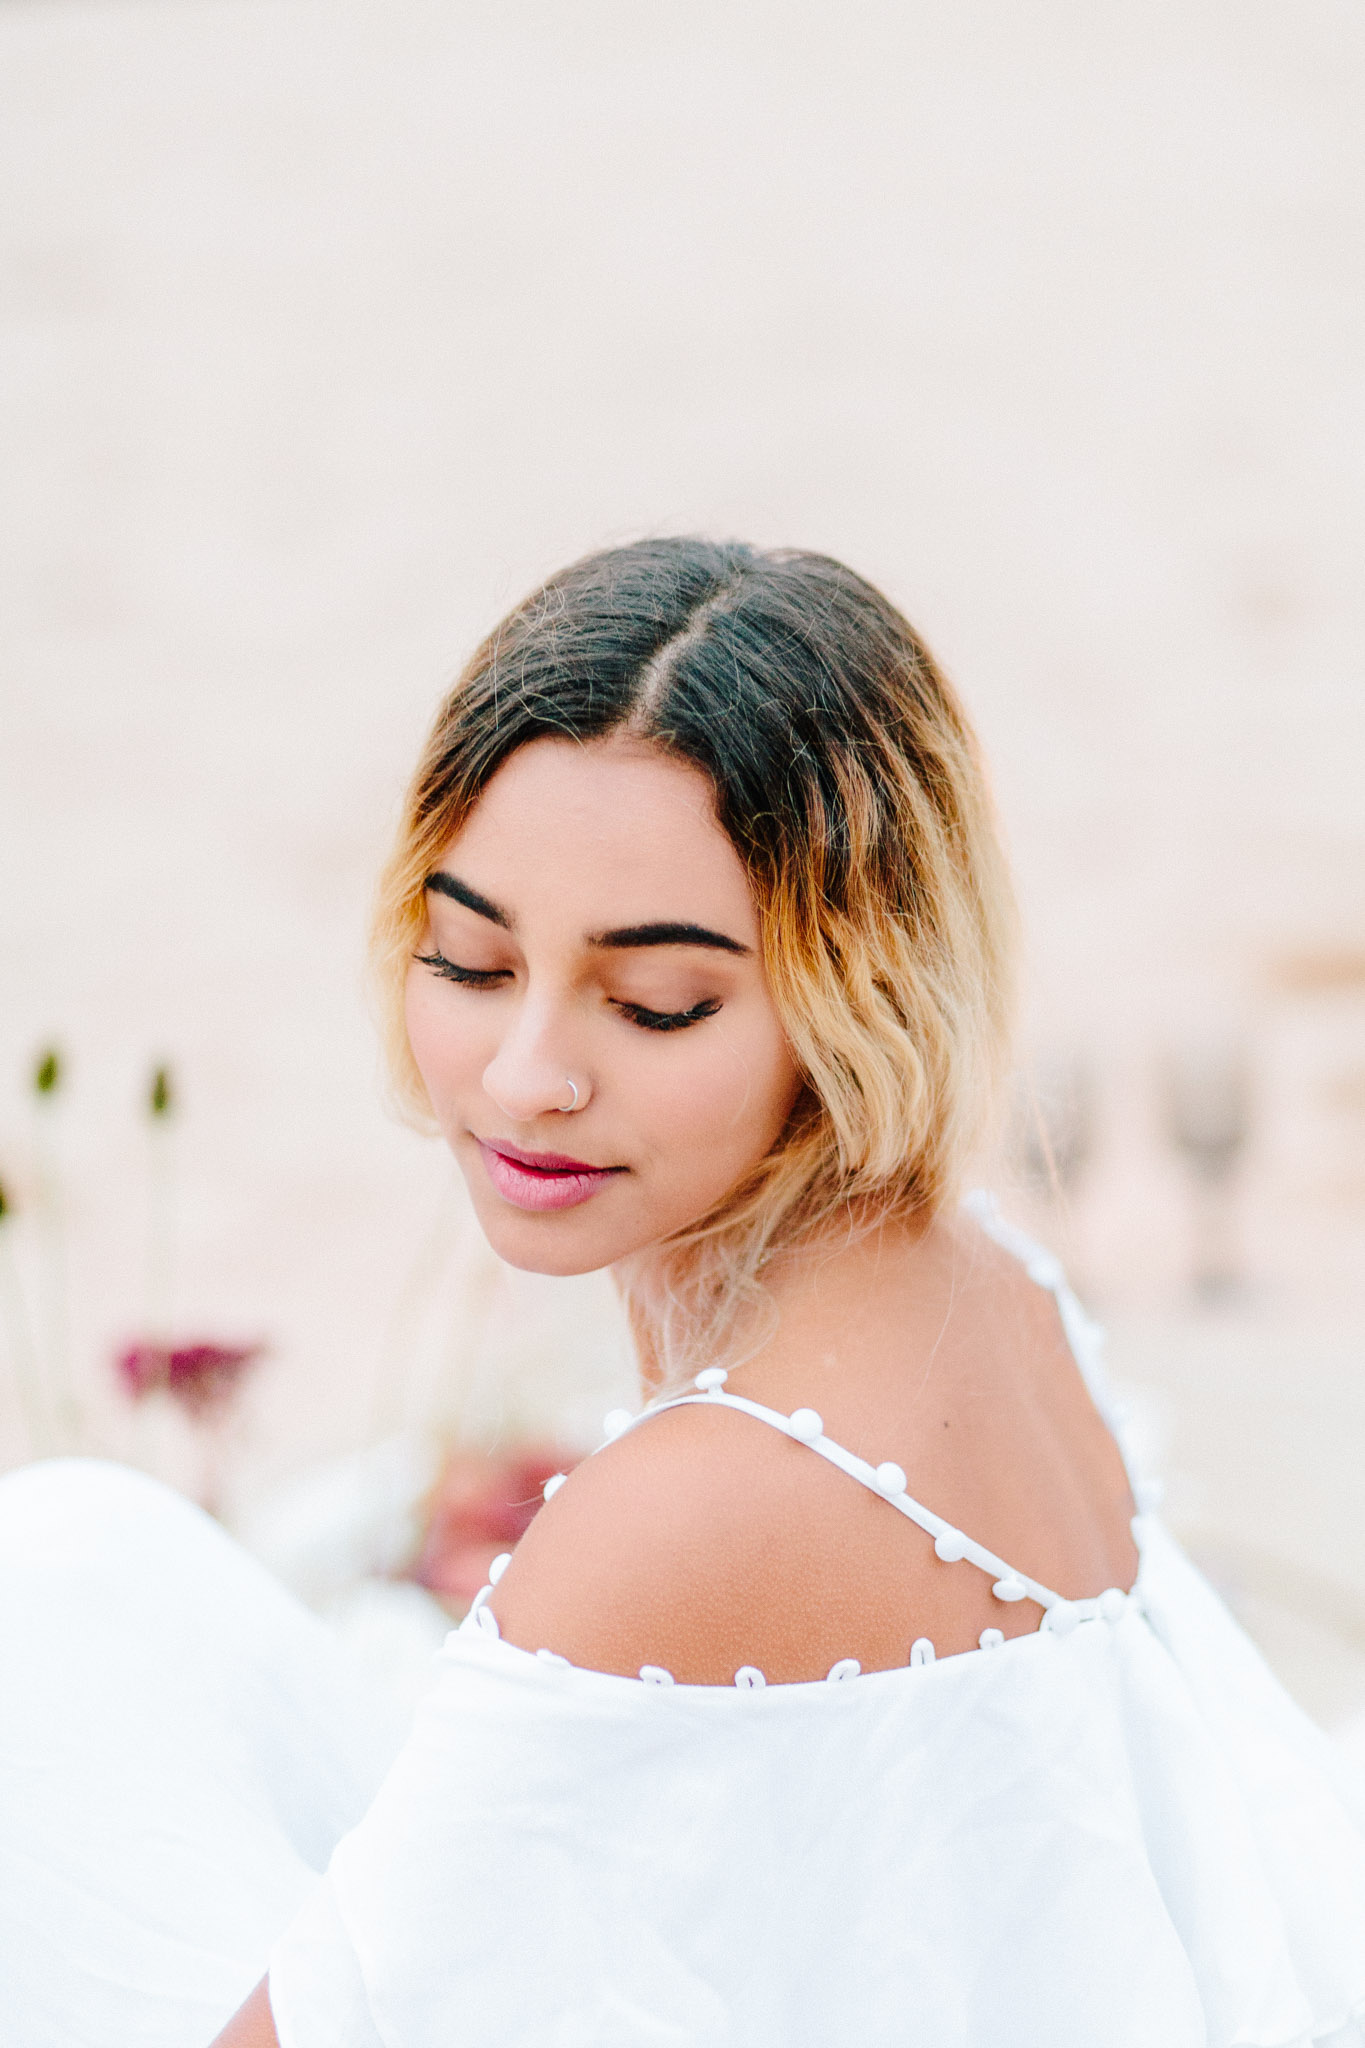 Speyer-Moroccan-Wedding-Inspiration-Pia-Anna-Christian-Wedding-Photography-S-74.jpg